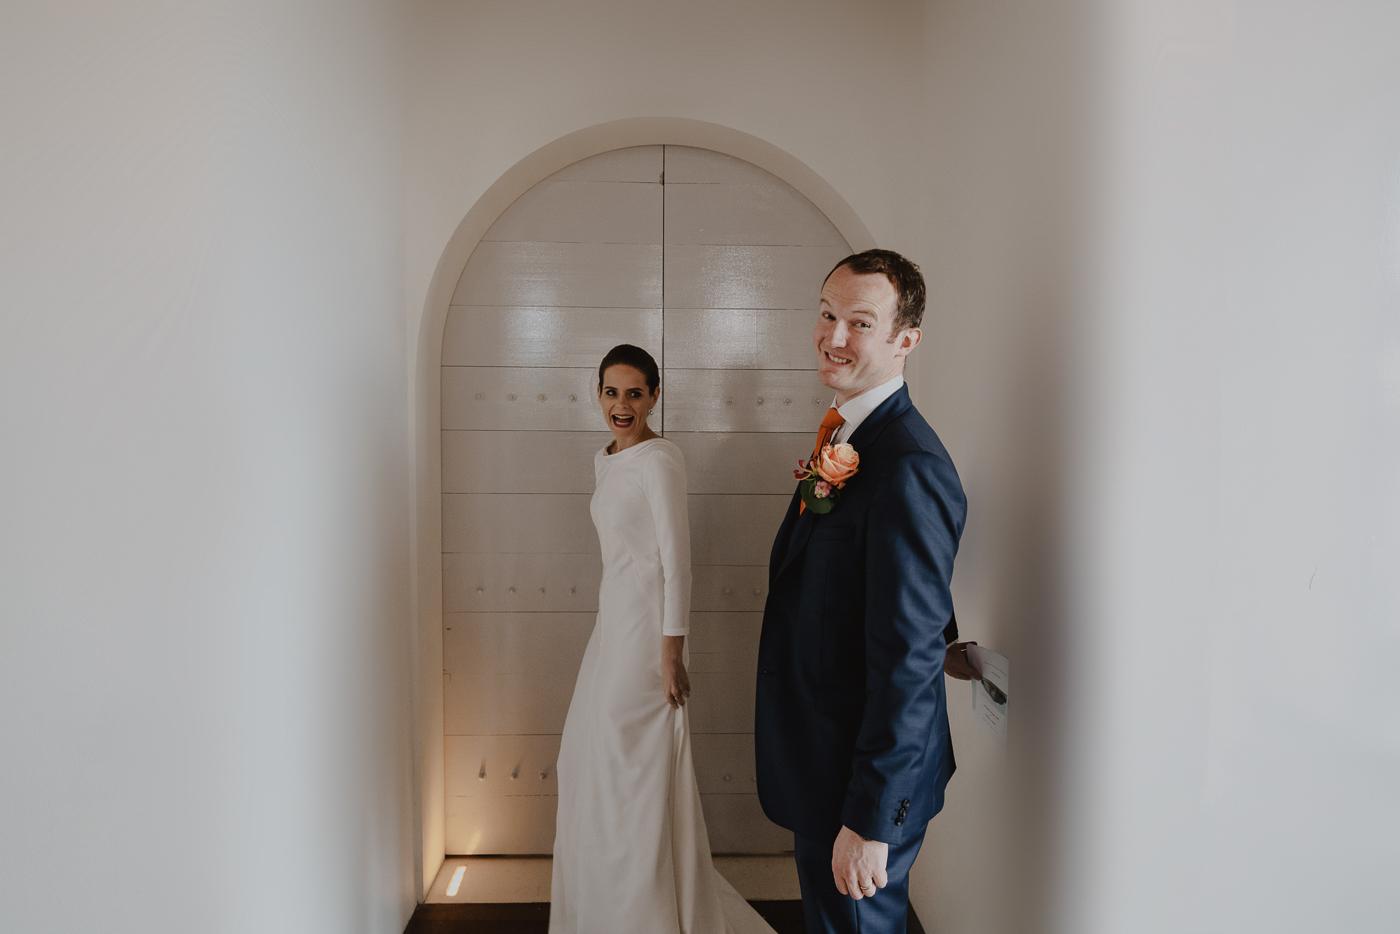 bruidsfotografie-trouwfotograaf-wedding-photographer-amsterdam-James-Jantine-200.jpg